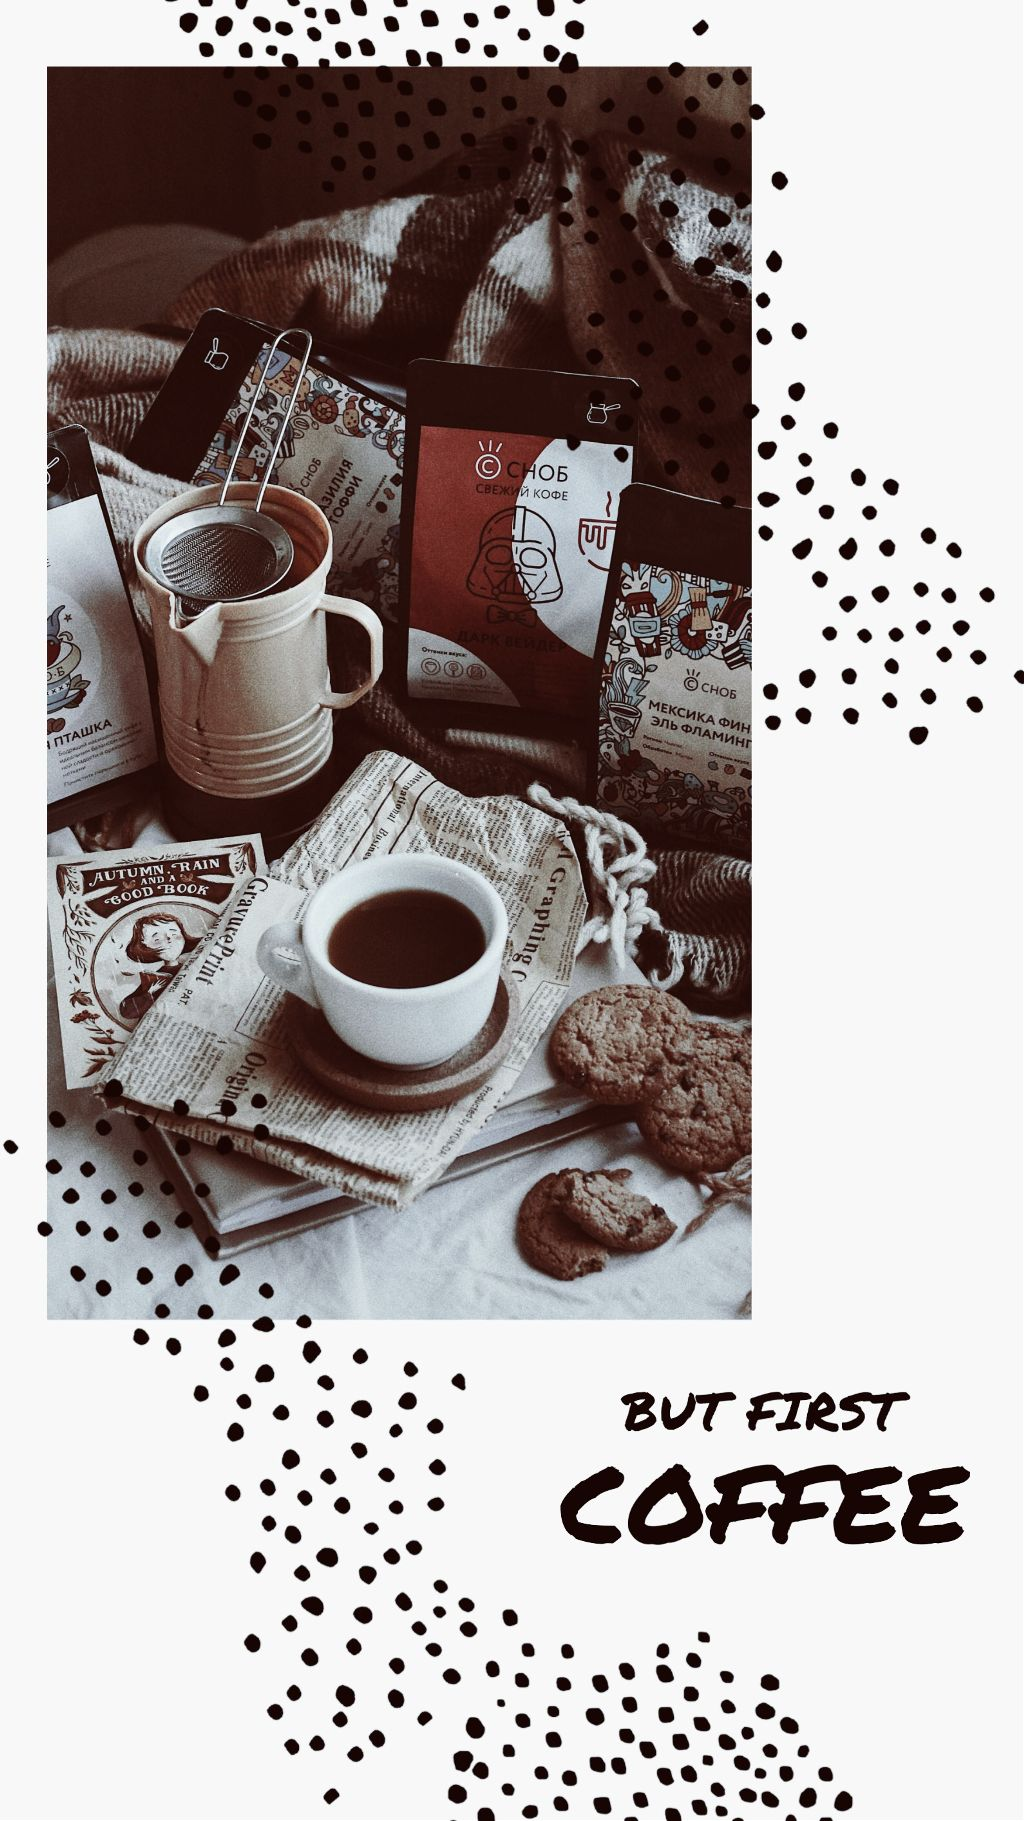 Ya man #butfirstcoffee #coffee #drink #vintage @brazy_junts- @dysismorales @giraffesareawesome @wtf_jabezvill @bitches_spamm @spicyturtle17 @peppa_pig_edit @wth_devenityperkins @lovelymacklannie @bruh_itsdaph @itzelianaa  @millie_for_mvp @5sos0reo   Sorry if u werent tagged 😬  #freetoedit